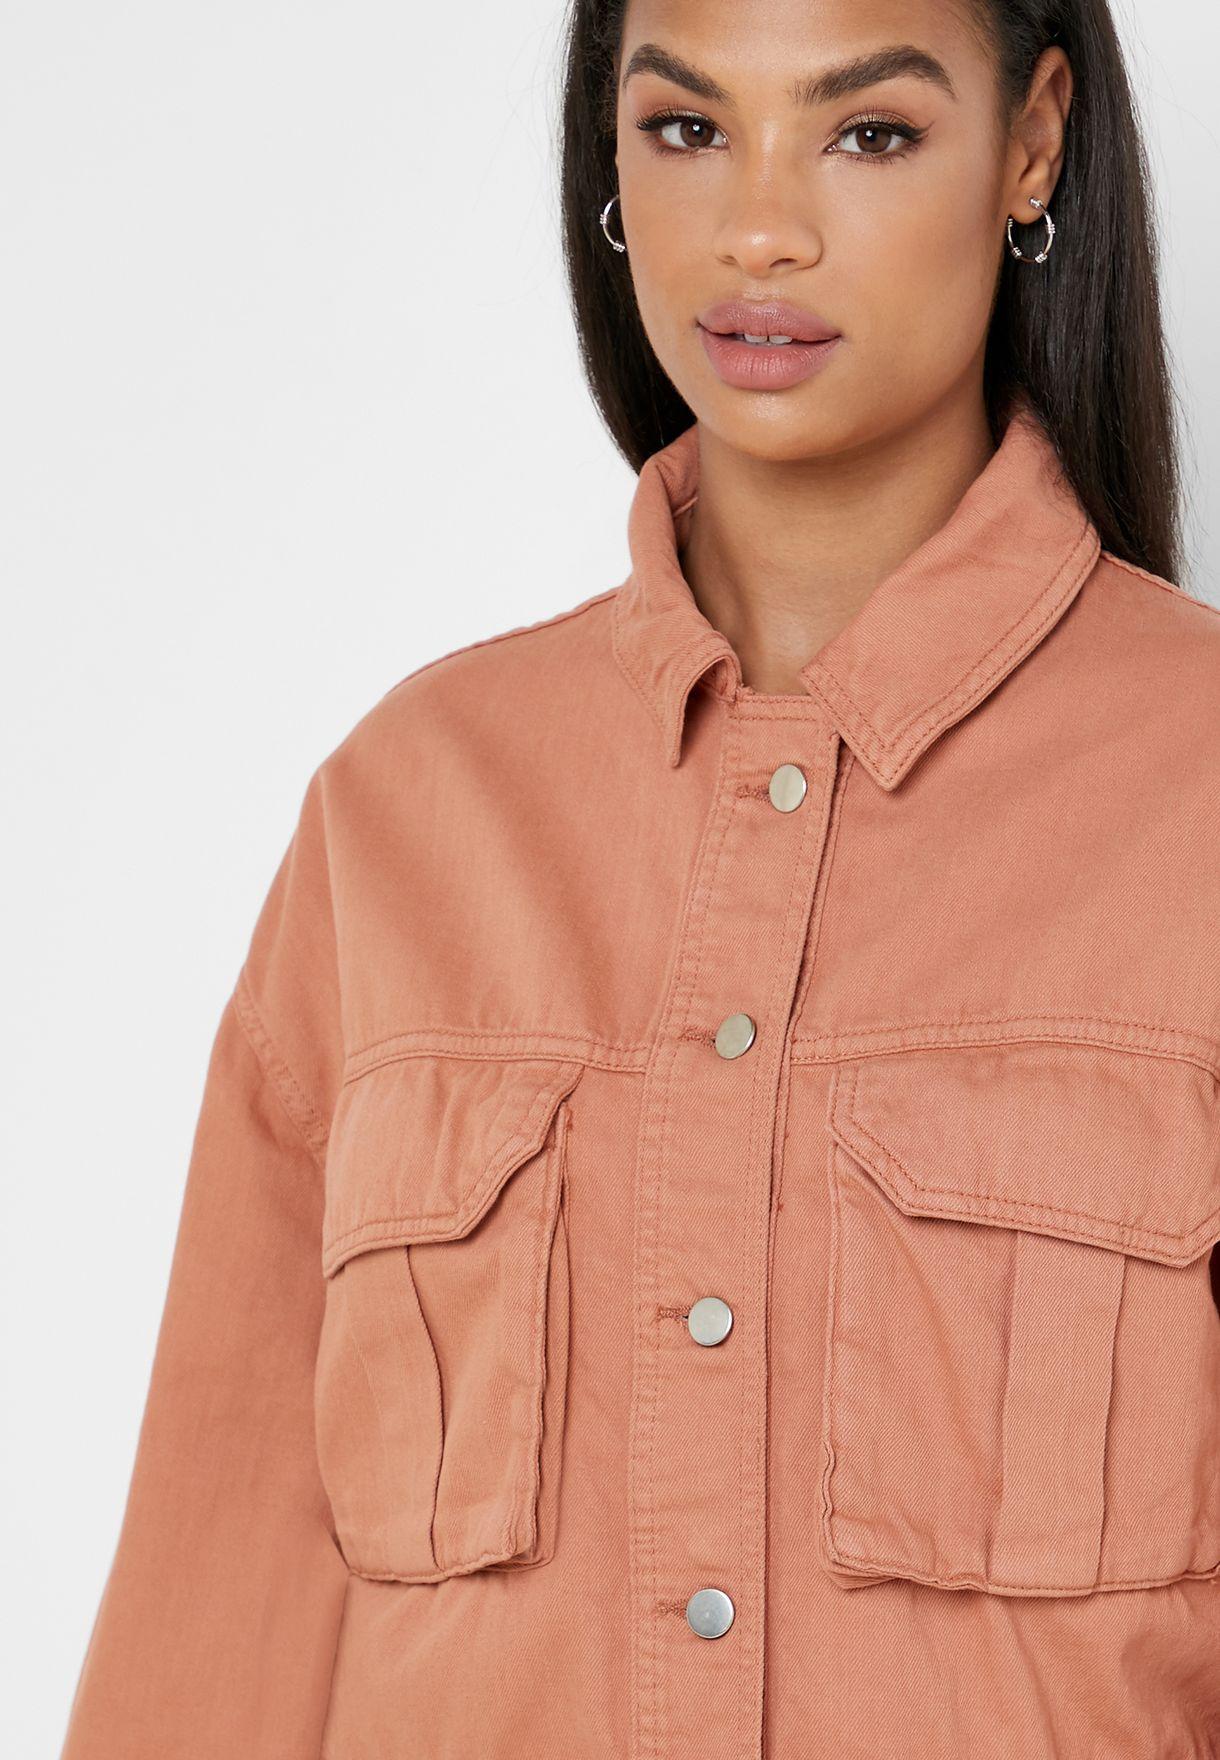 Boxy Utility Denim Jacket